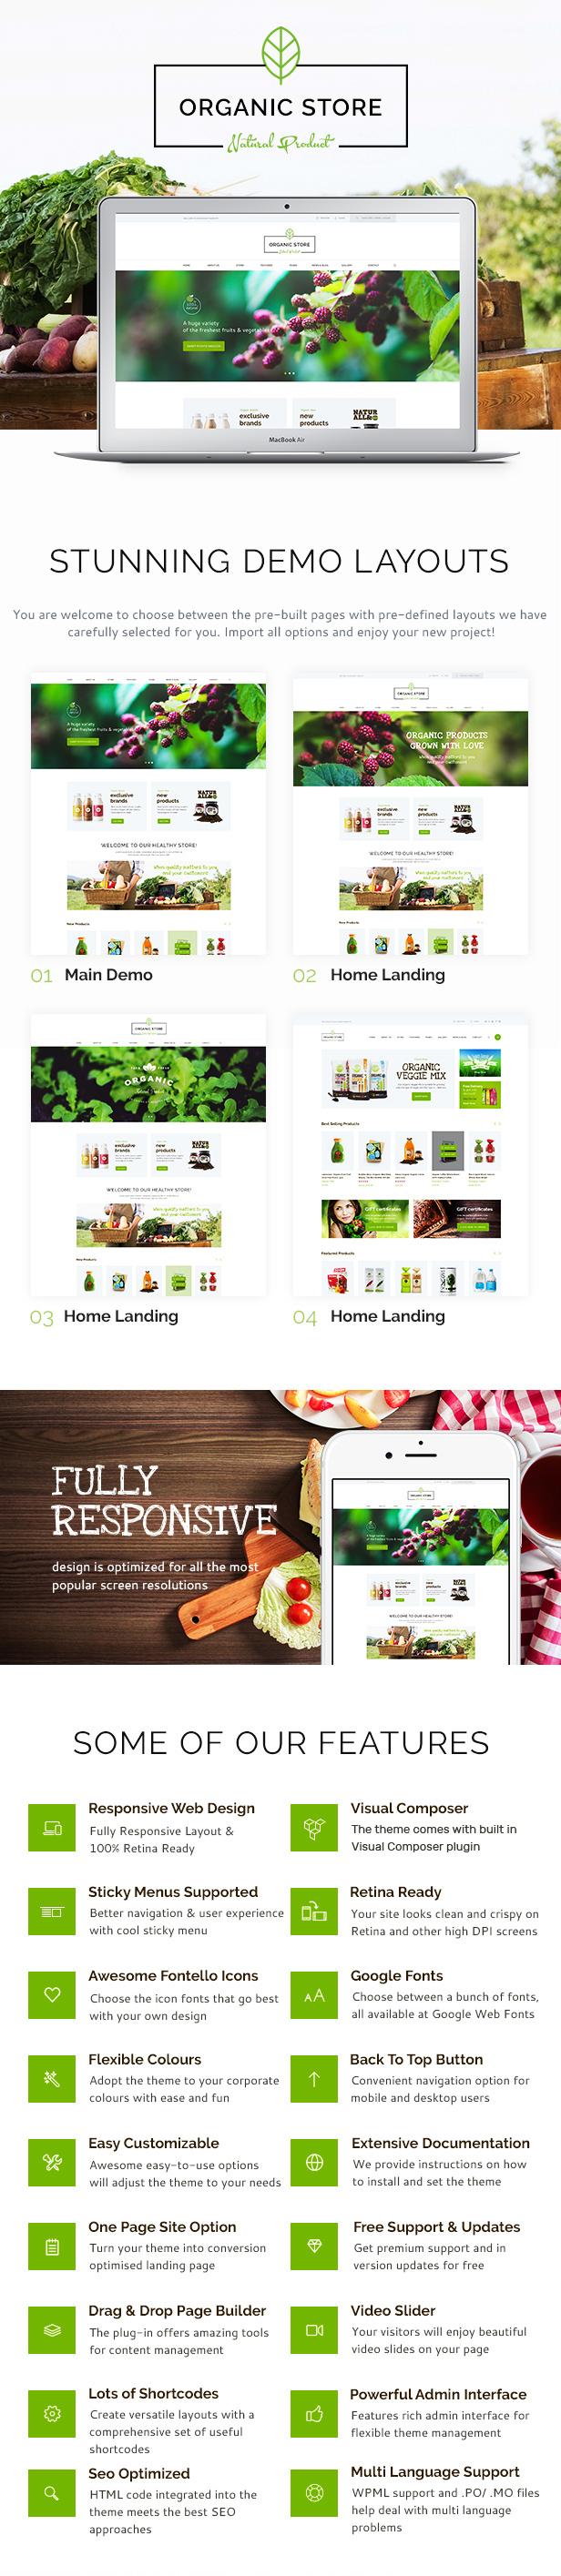 Organic Store | Organic Food & Eco Products WordPress Theme + RTL - 1